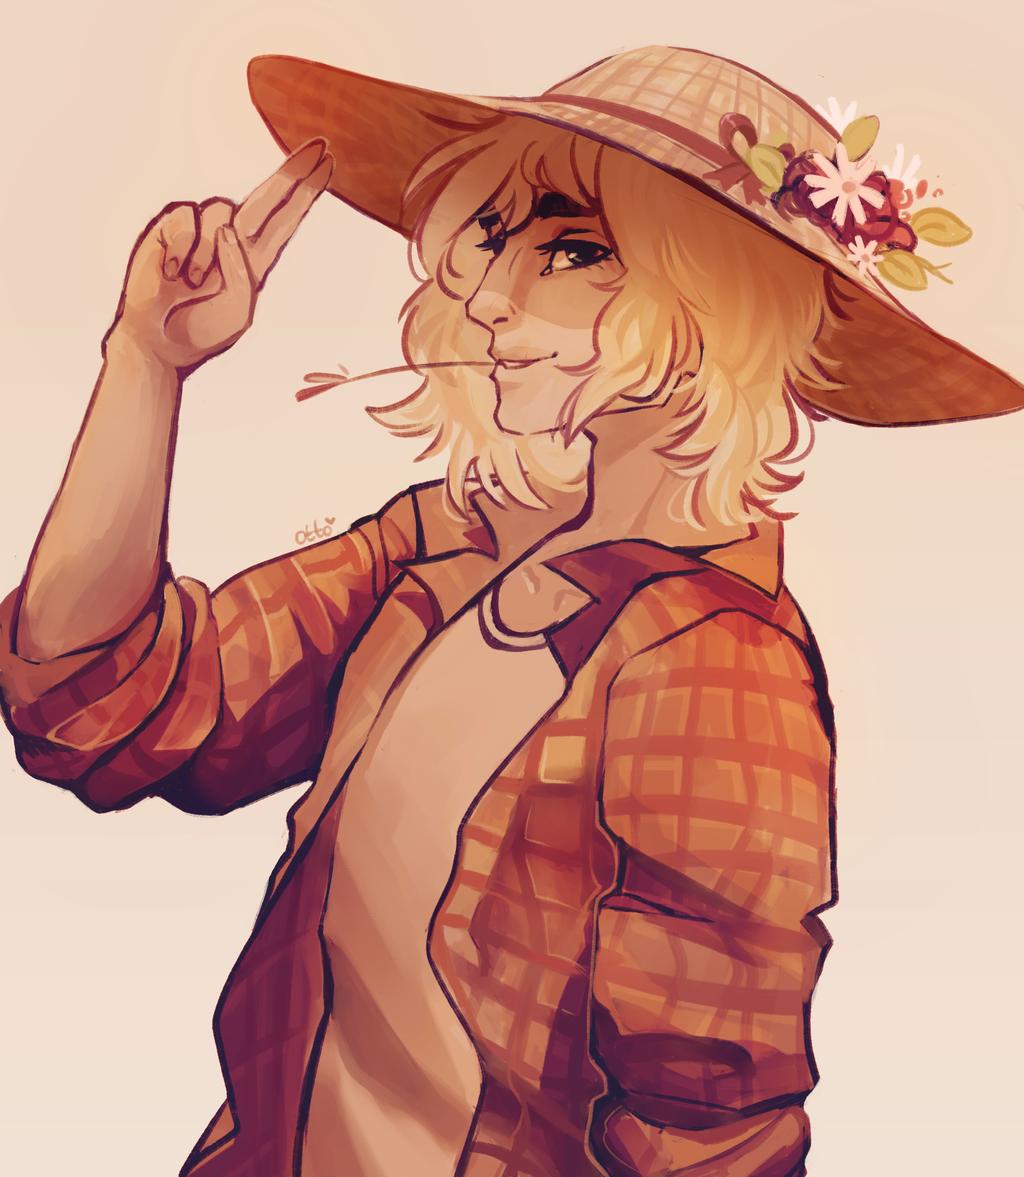 Handsome Farmer by R0BUTT